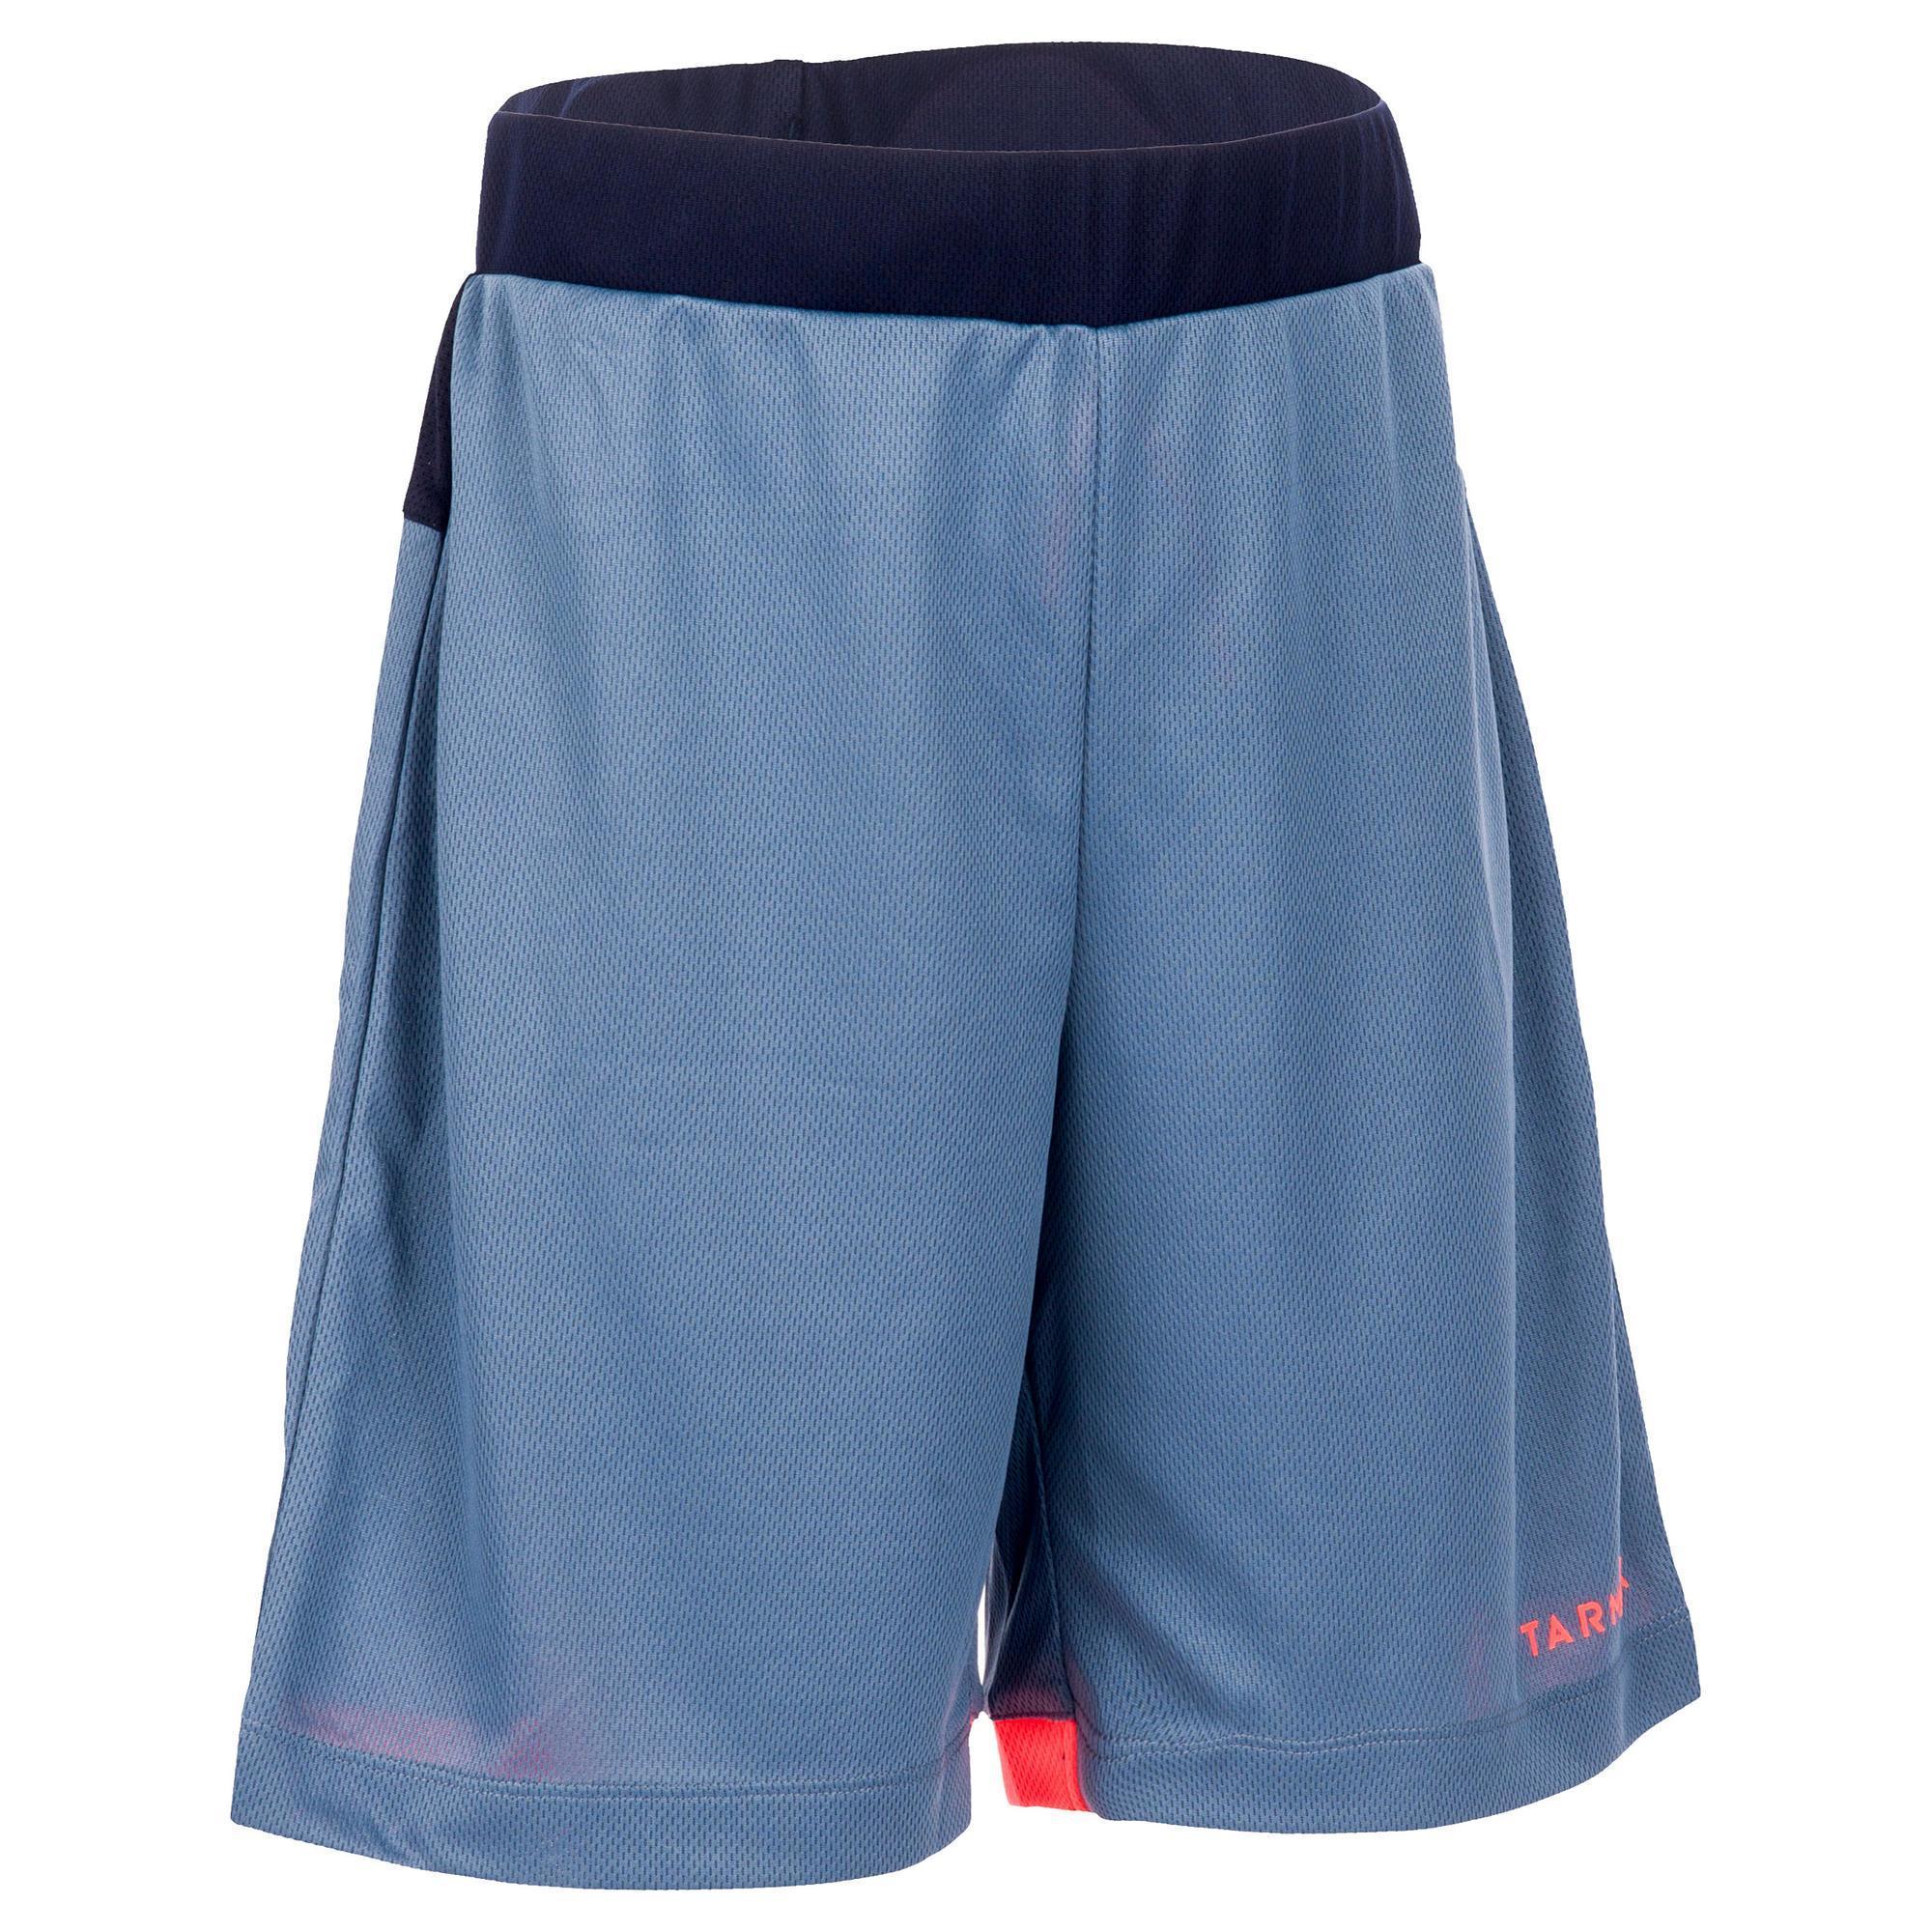 Basketballshorts B500 Jungen/Mädchen Fortgeschrittene grau/dunkelblau/rosa   Sportbekleidung > Sporthosen > Basketballshorts   Tarmak